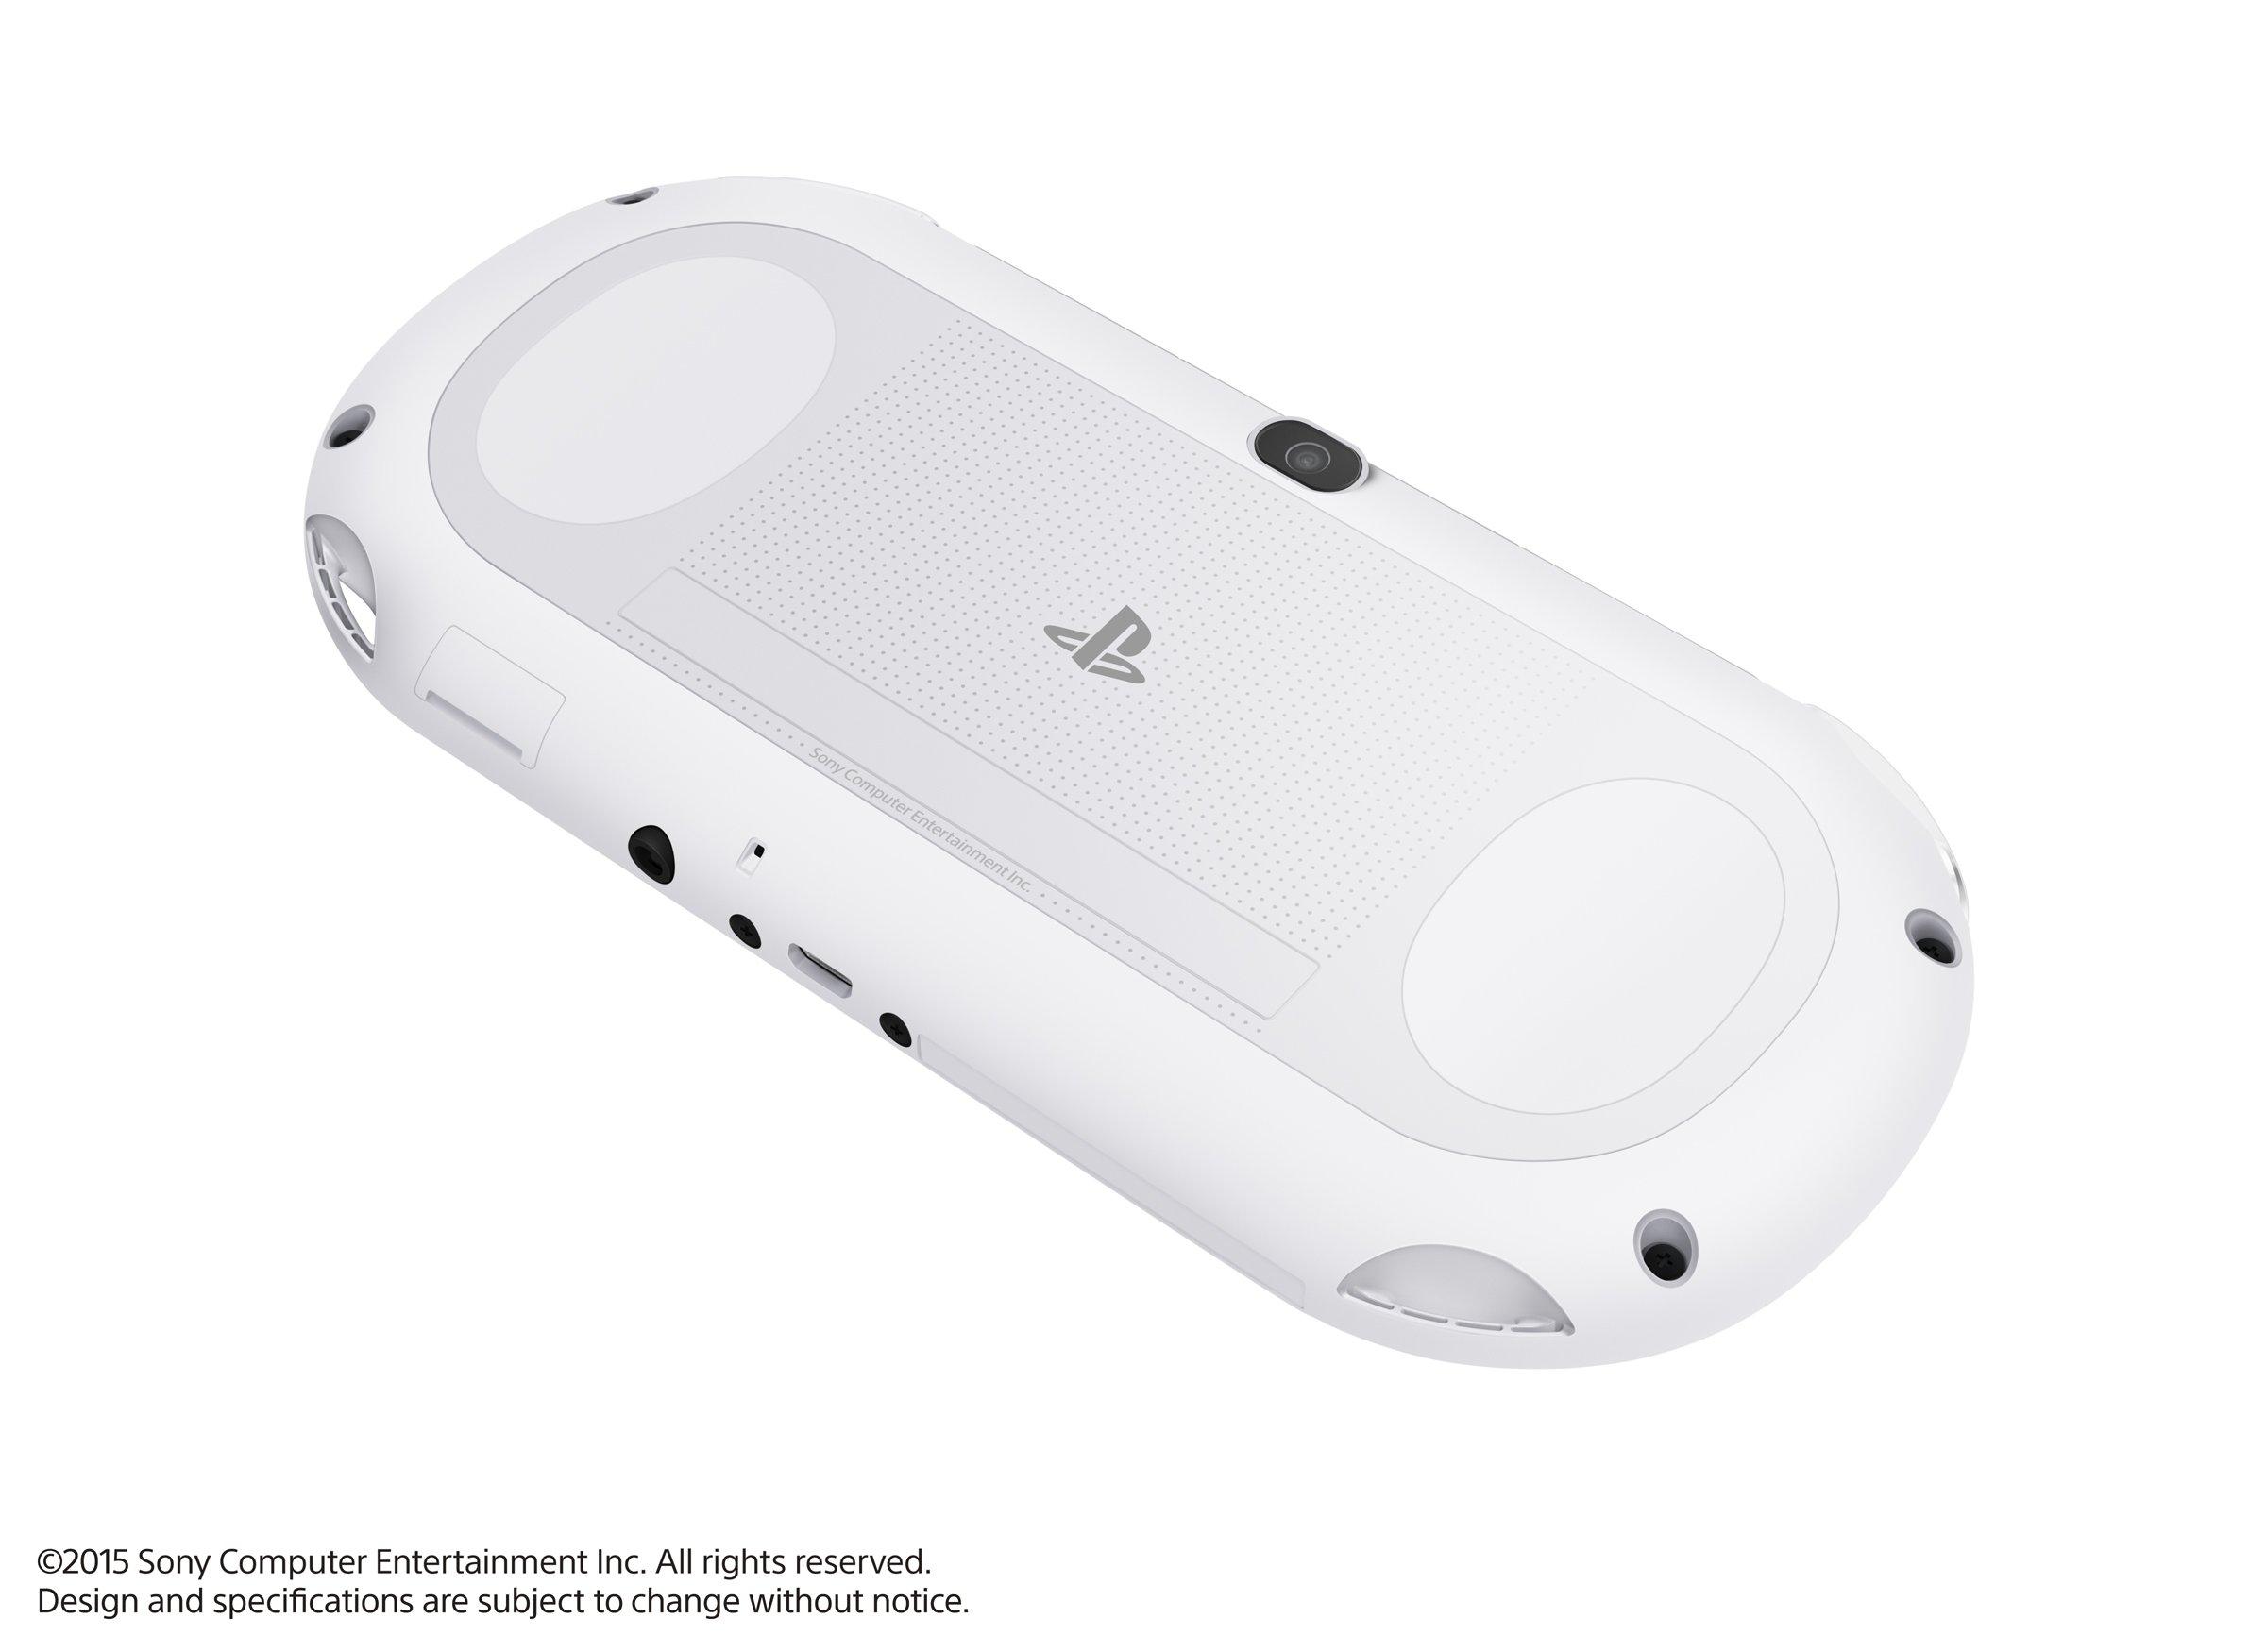 PlayStation Vita Wi-Fi model Glacier White (PCH-2000ZA22) Japanese Ver. Japan Import by Sony (Image #5)